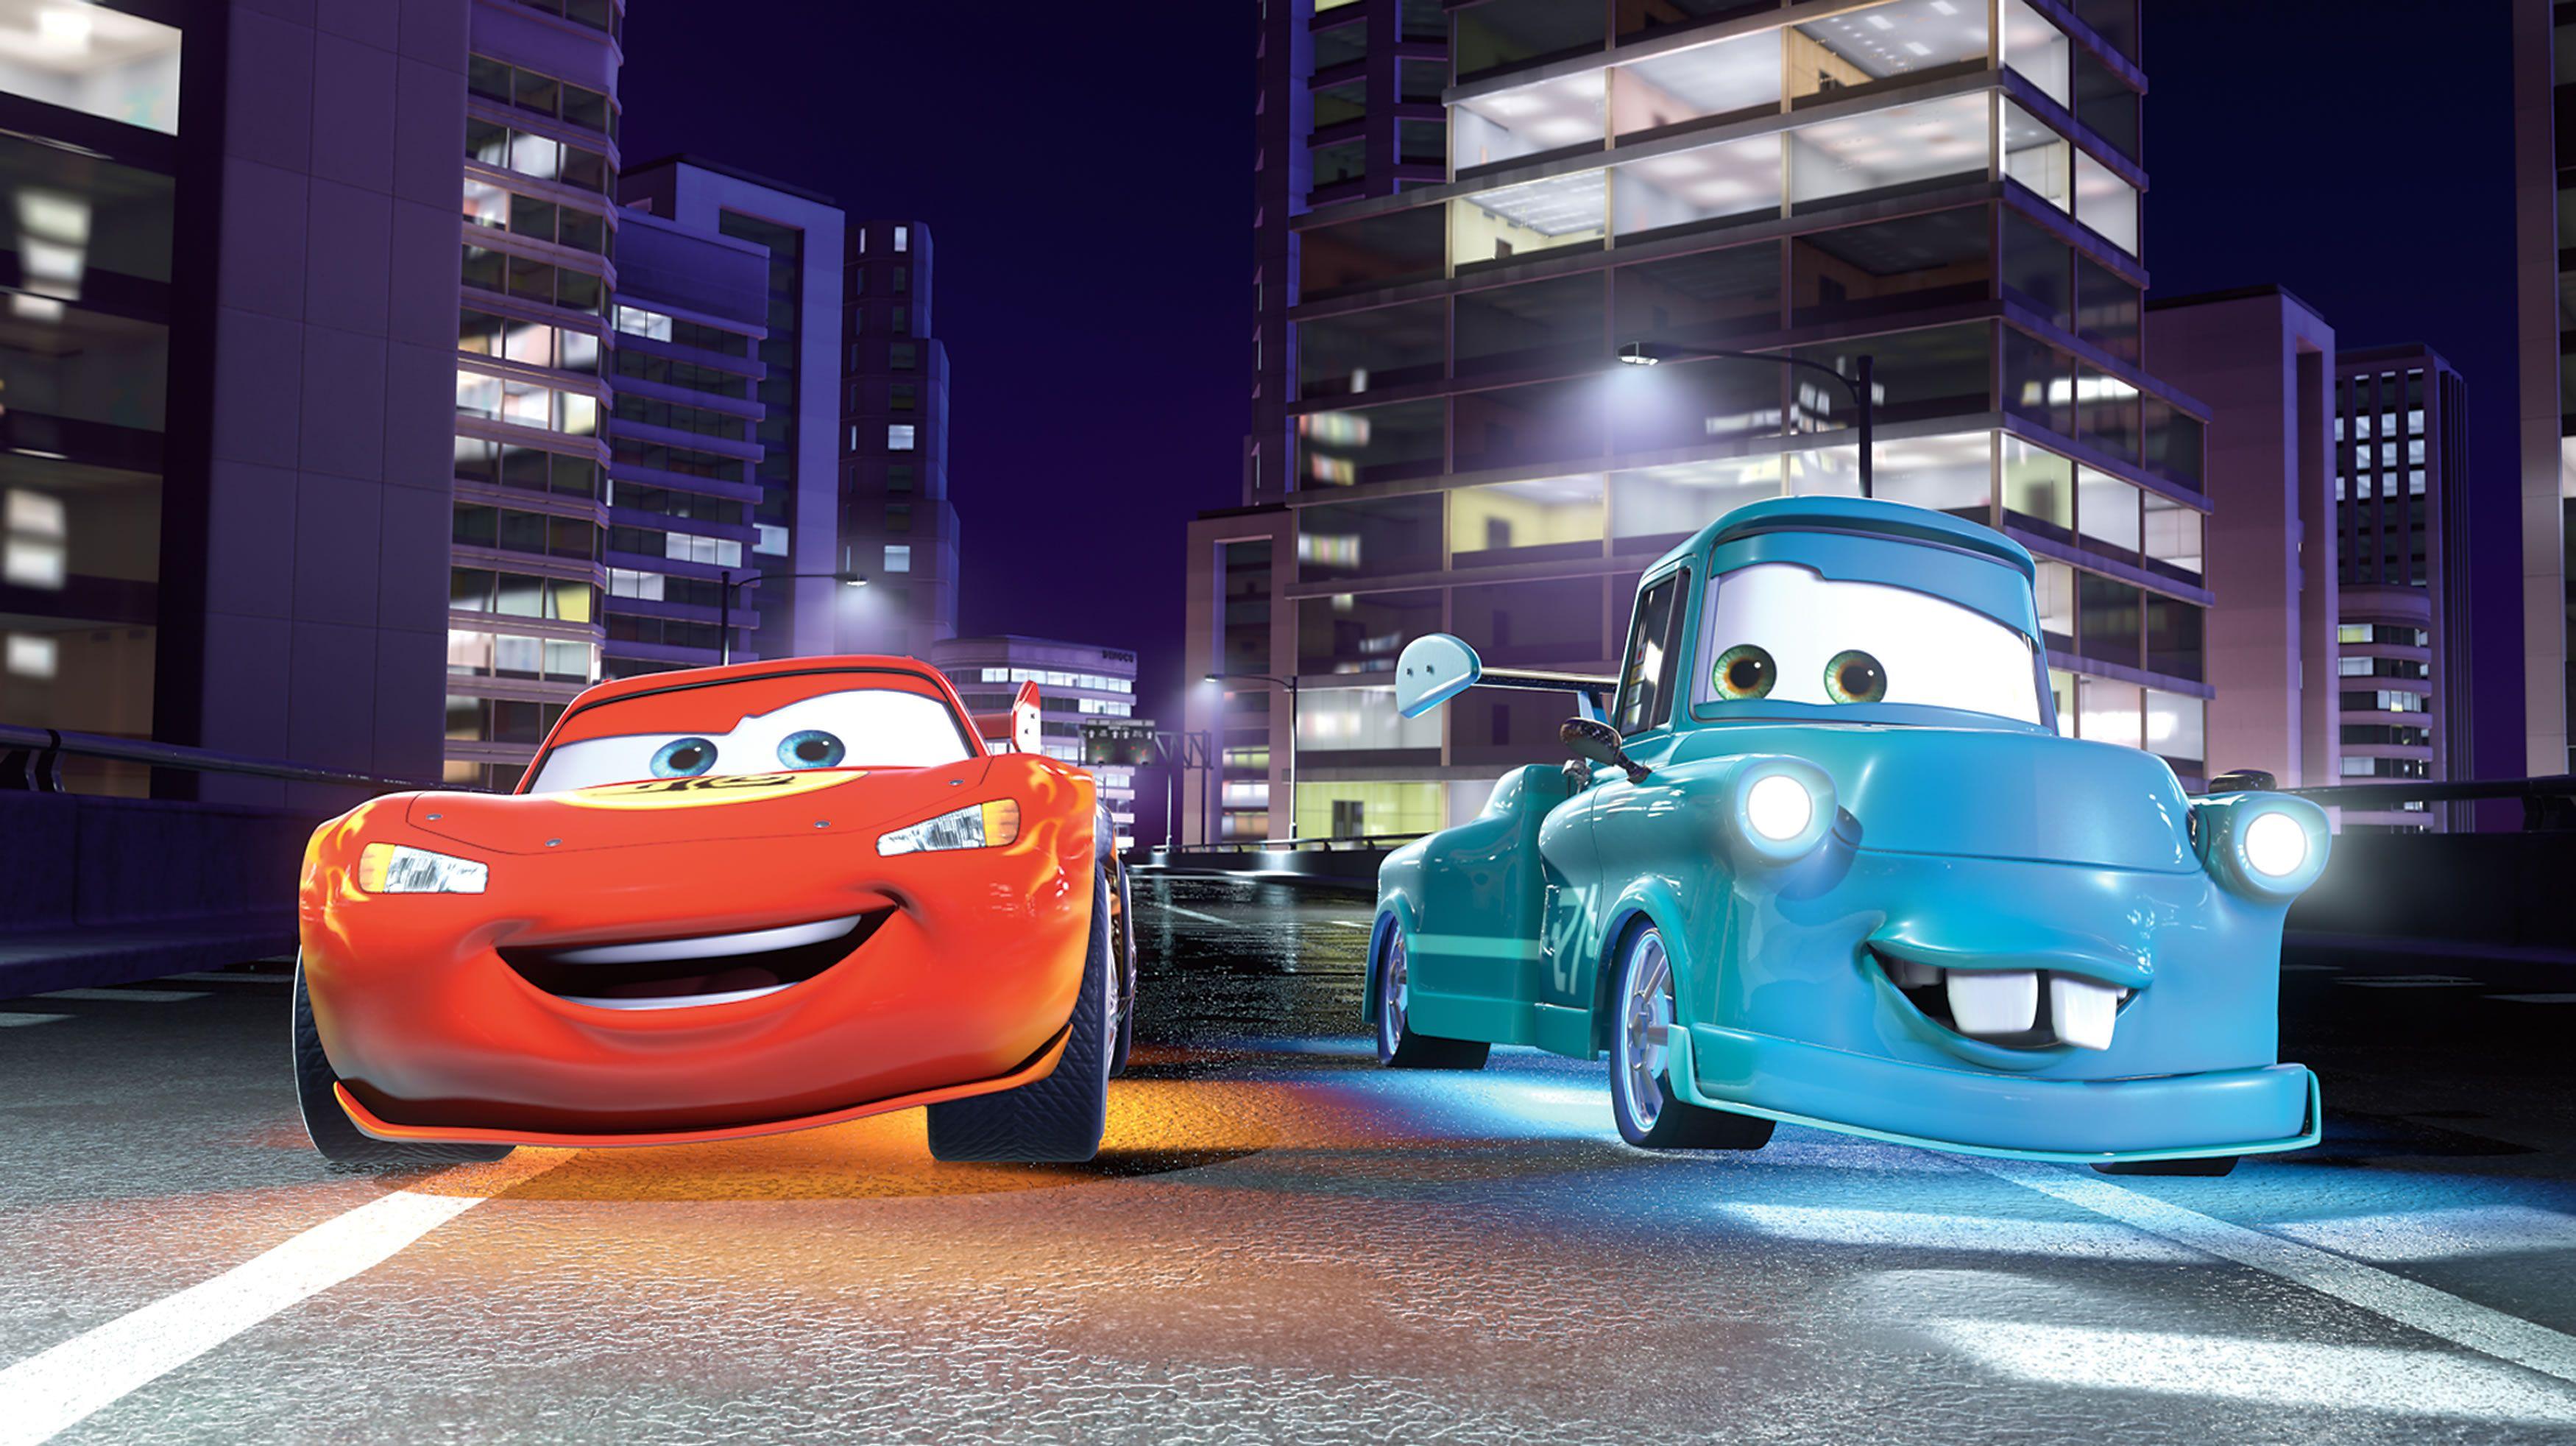 Cars 2 Movie Cars 2 Movie Wallpaper Cars 2 Movie Wallpaper Cars